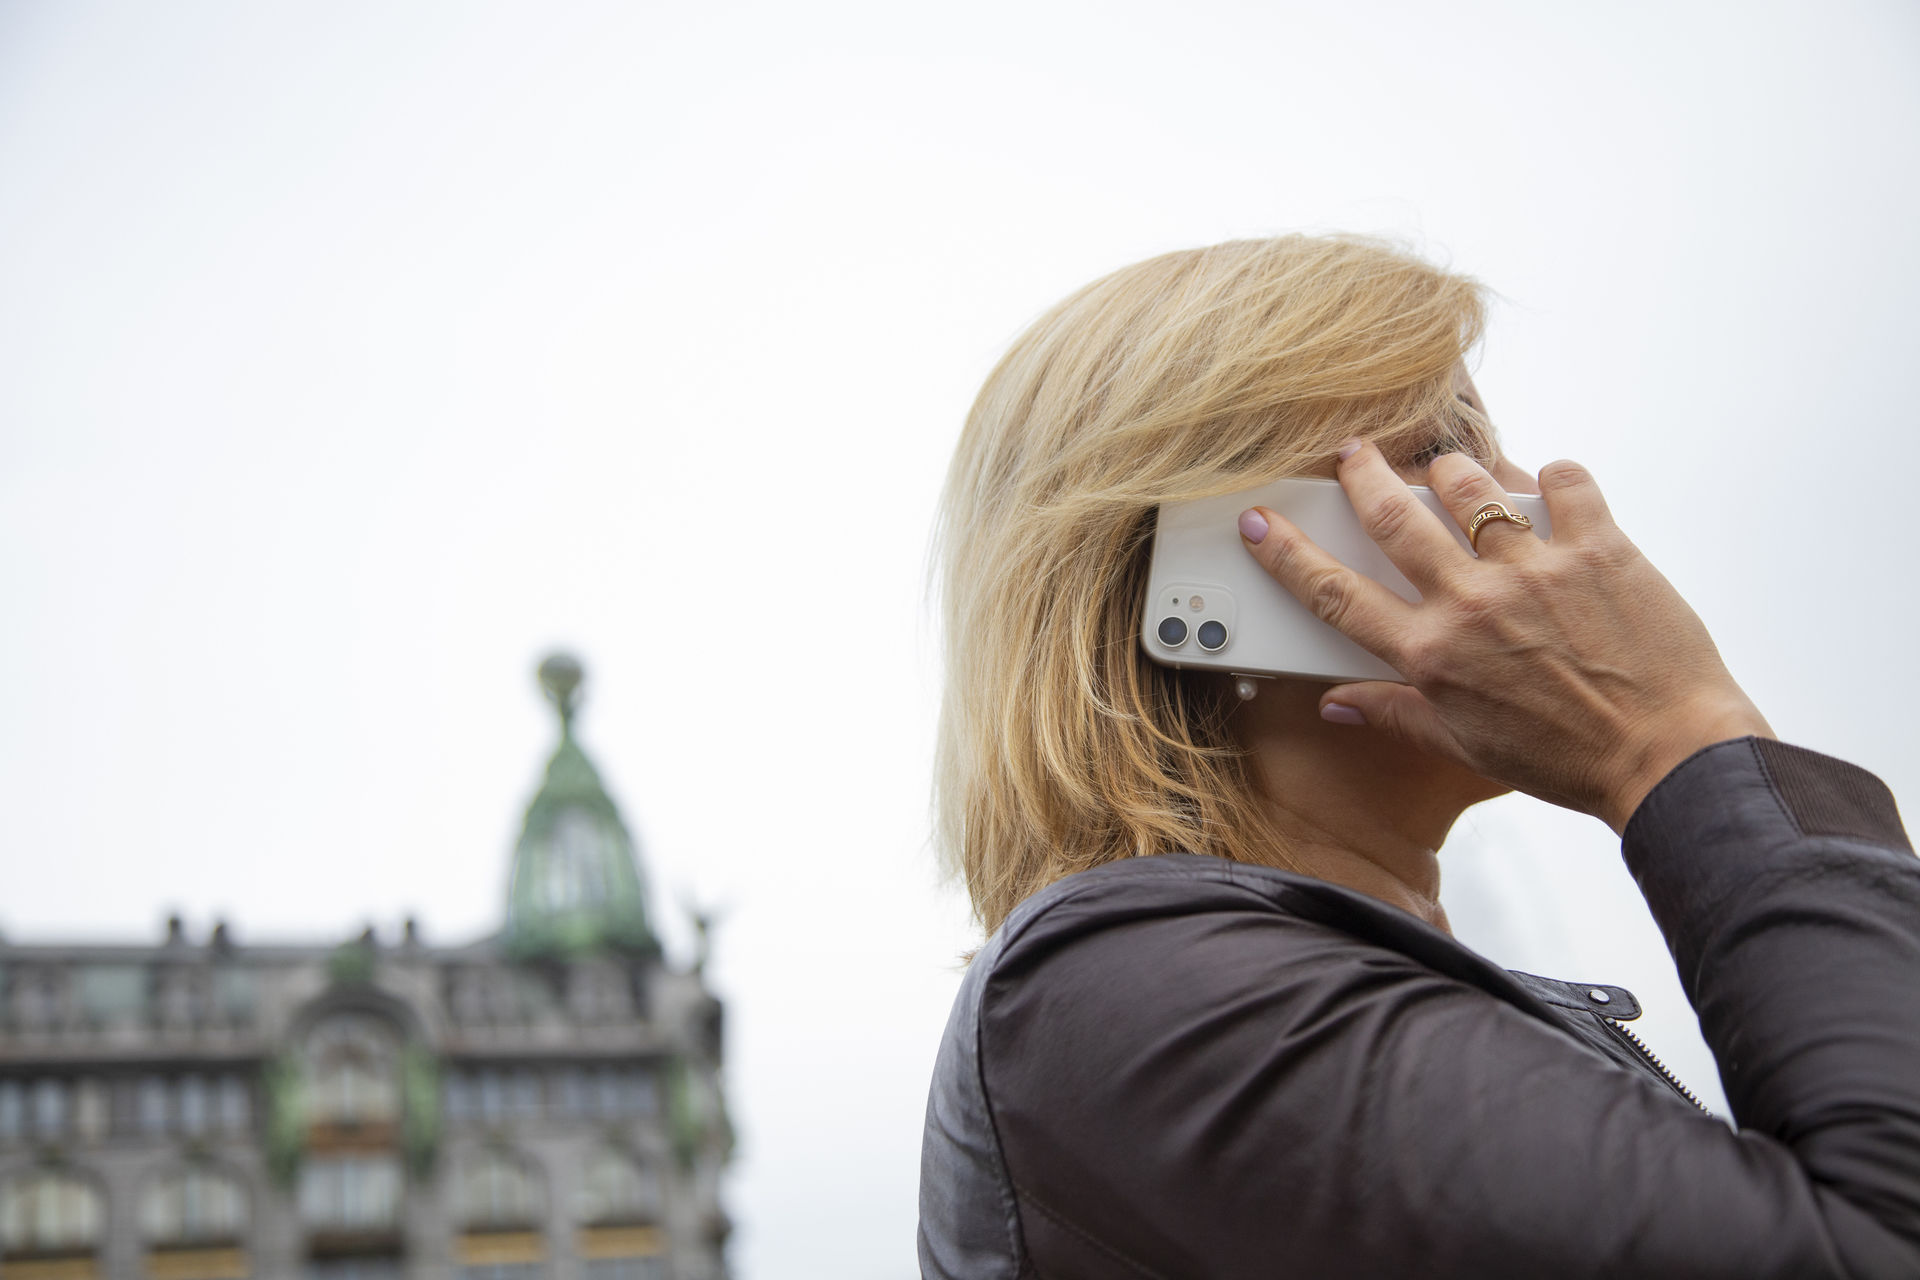 Инфекционист предупредила о рисках инфицирования через смартфон